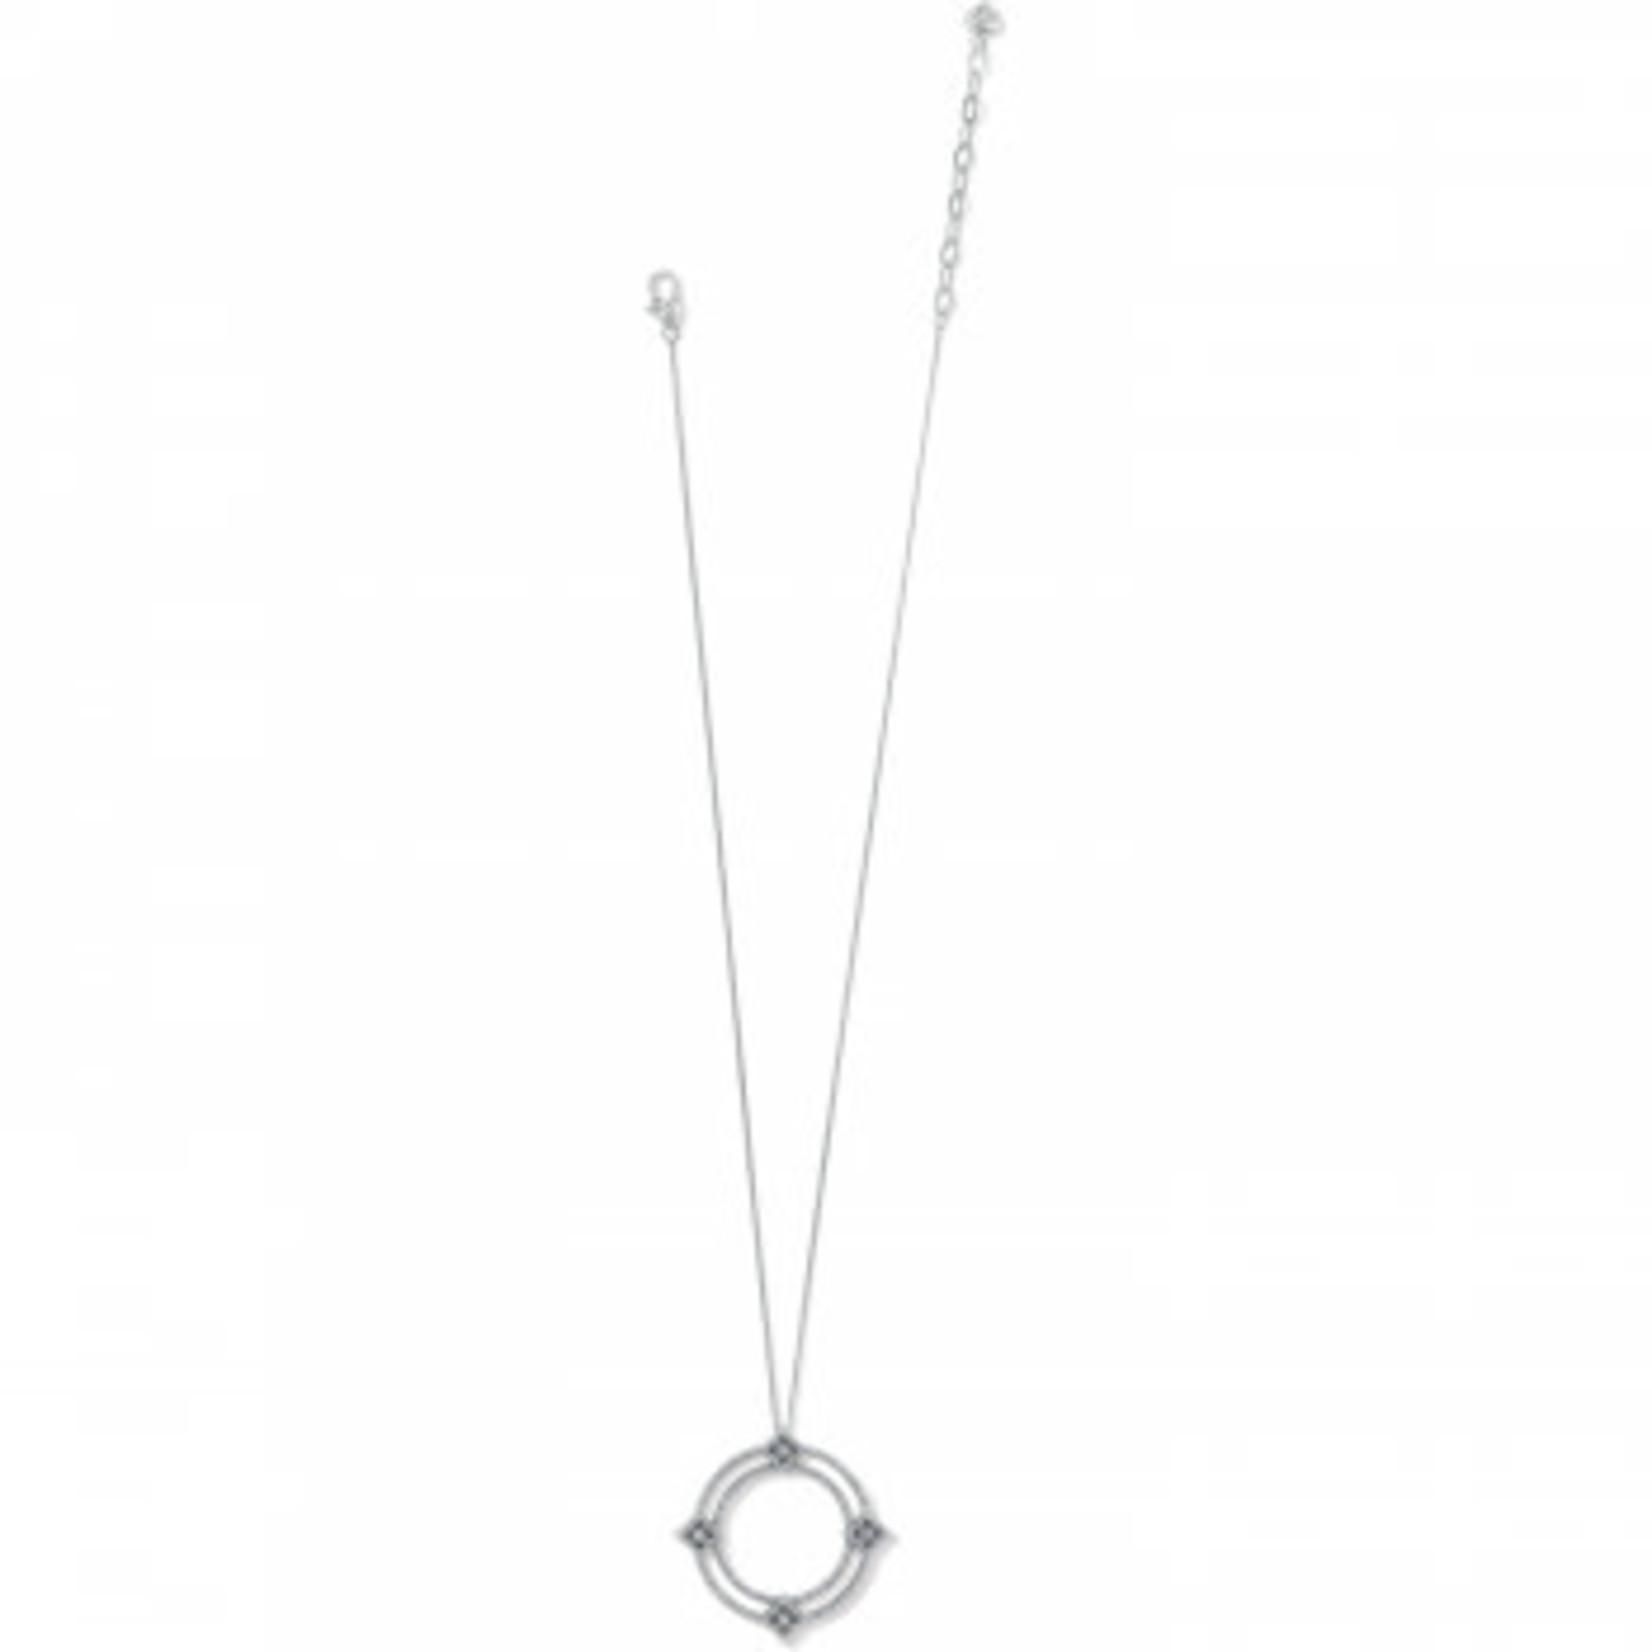 Brighton Illumina Diamond Ring Necklace - Silver